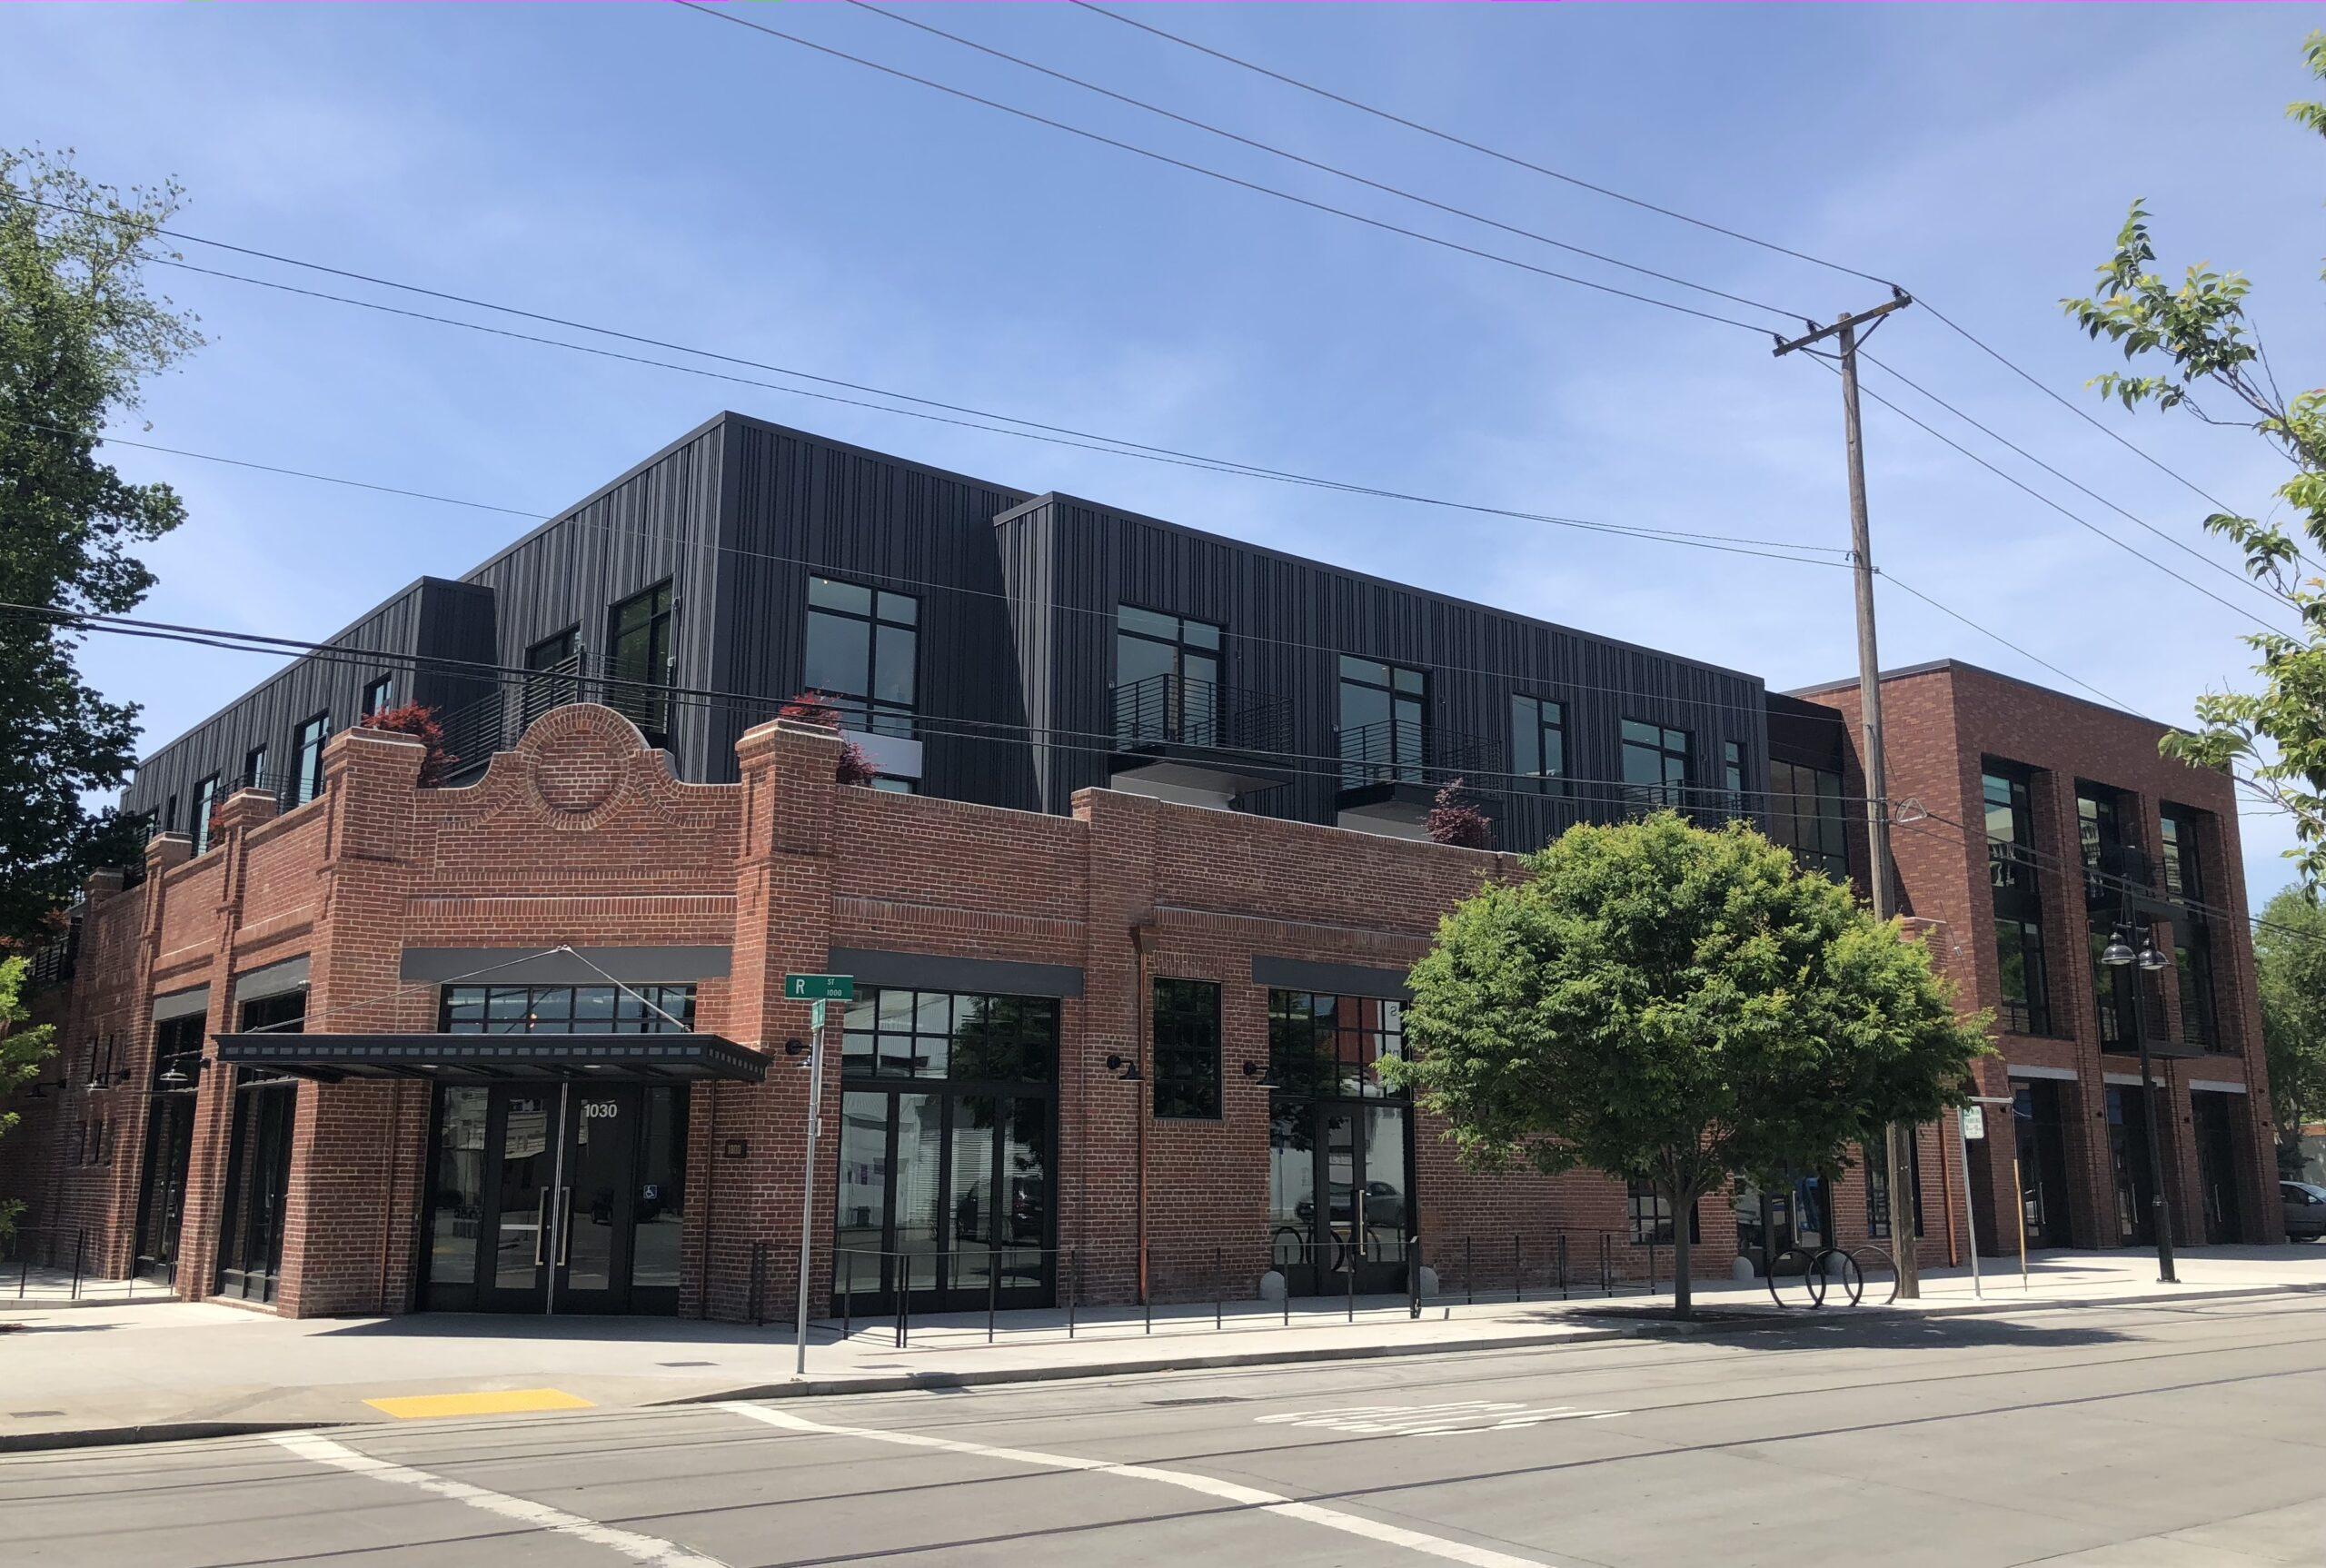 Sacramento Commercial Real Estate News